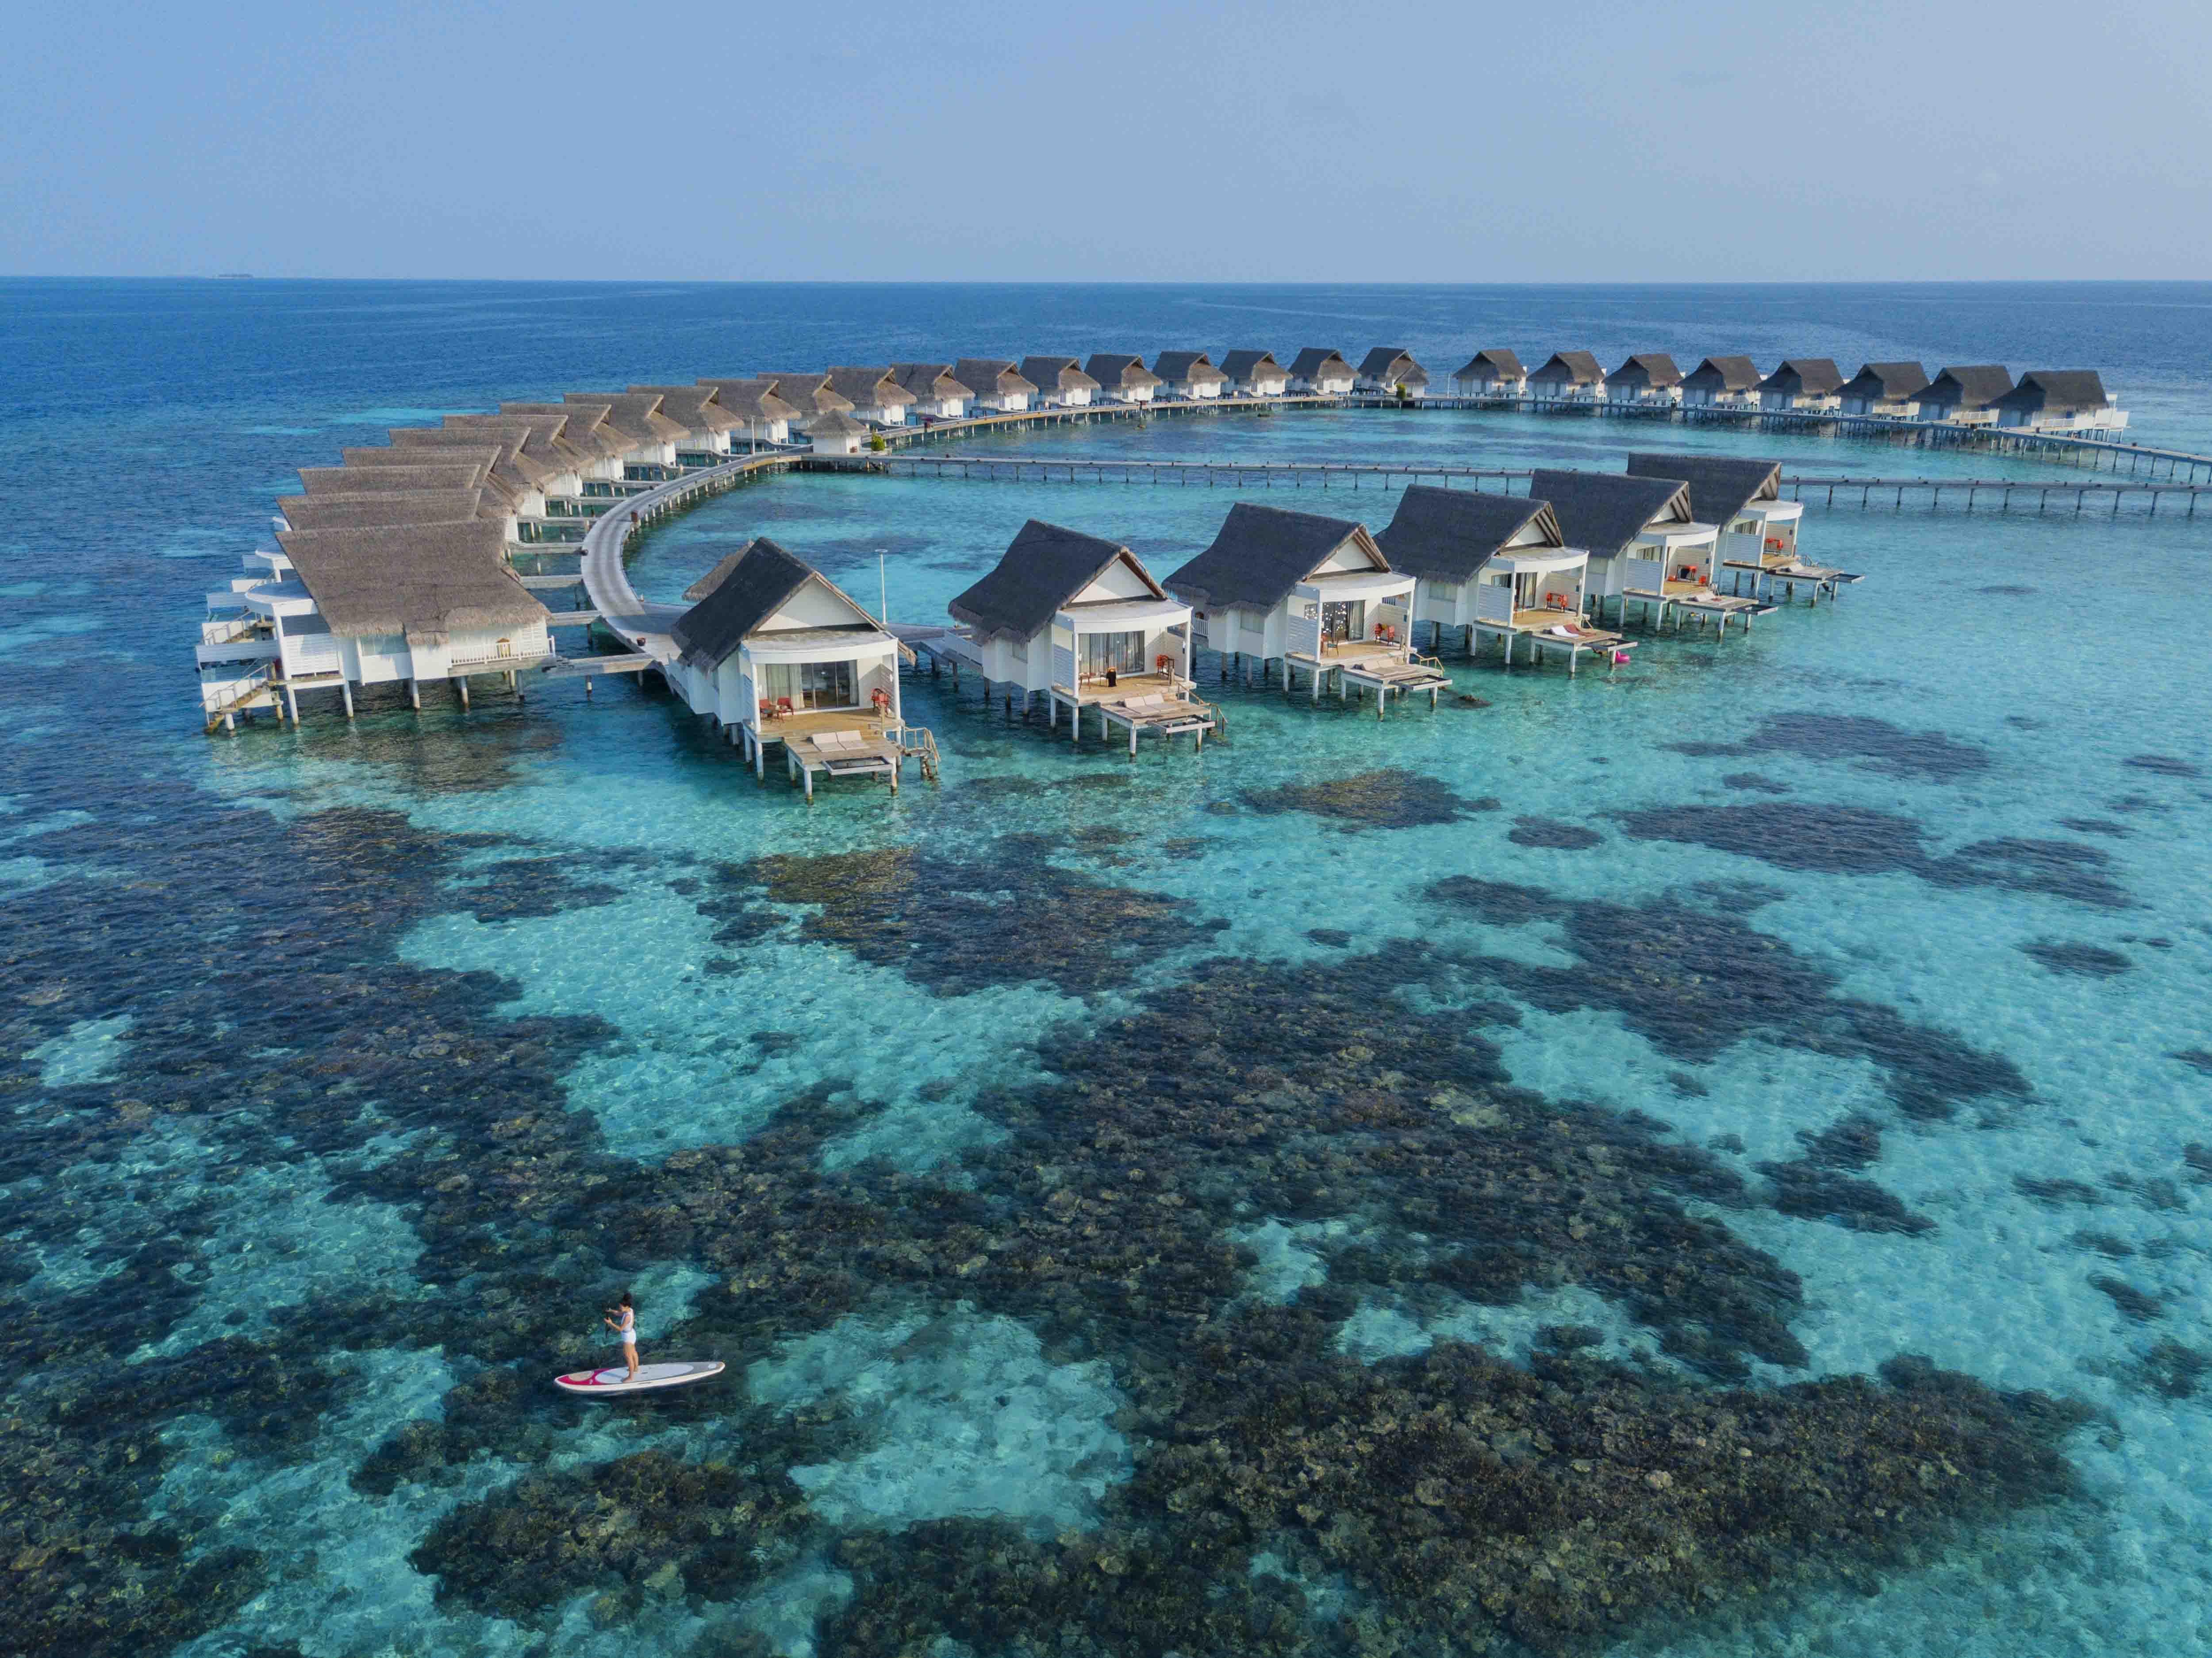 Bãi biển Maldive ở Centara Grand Island Resort & Spa Maldives